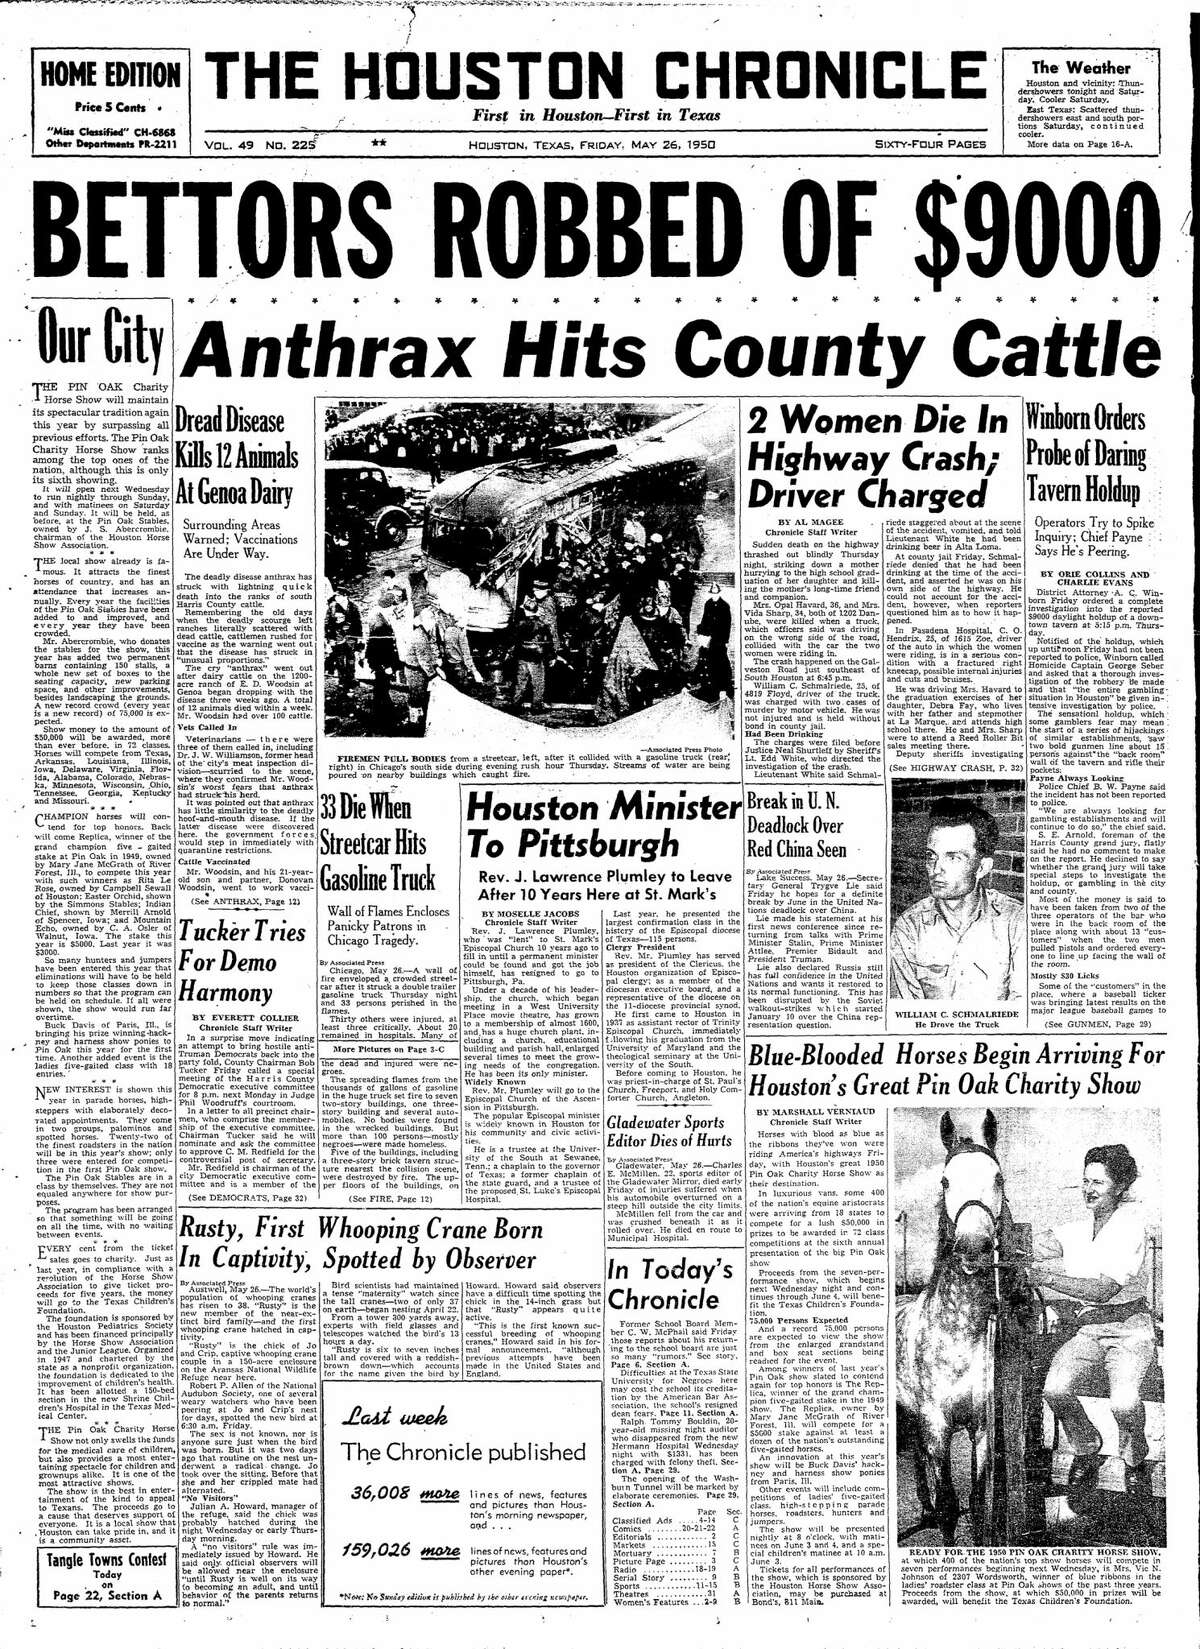 Houston Chronicle headline from May 26, 1950.